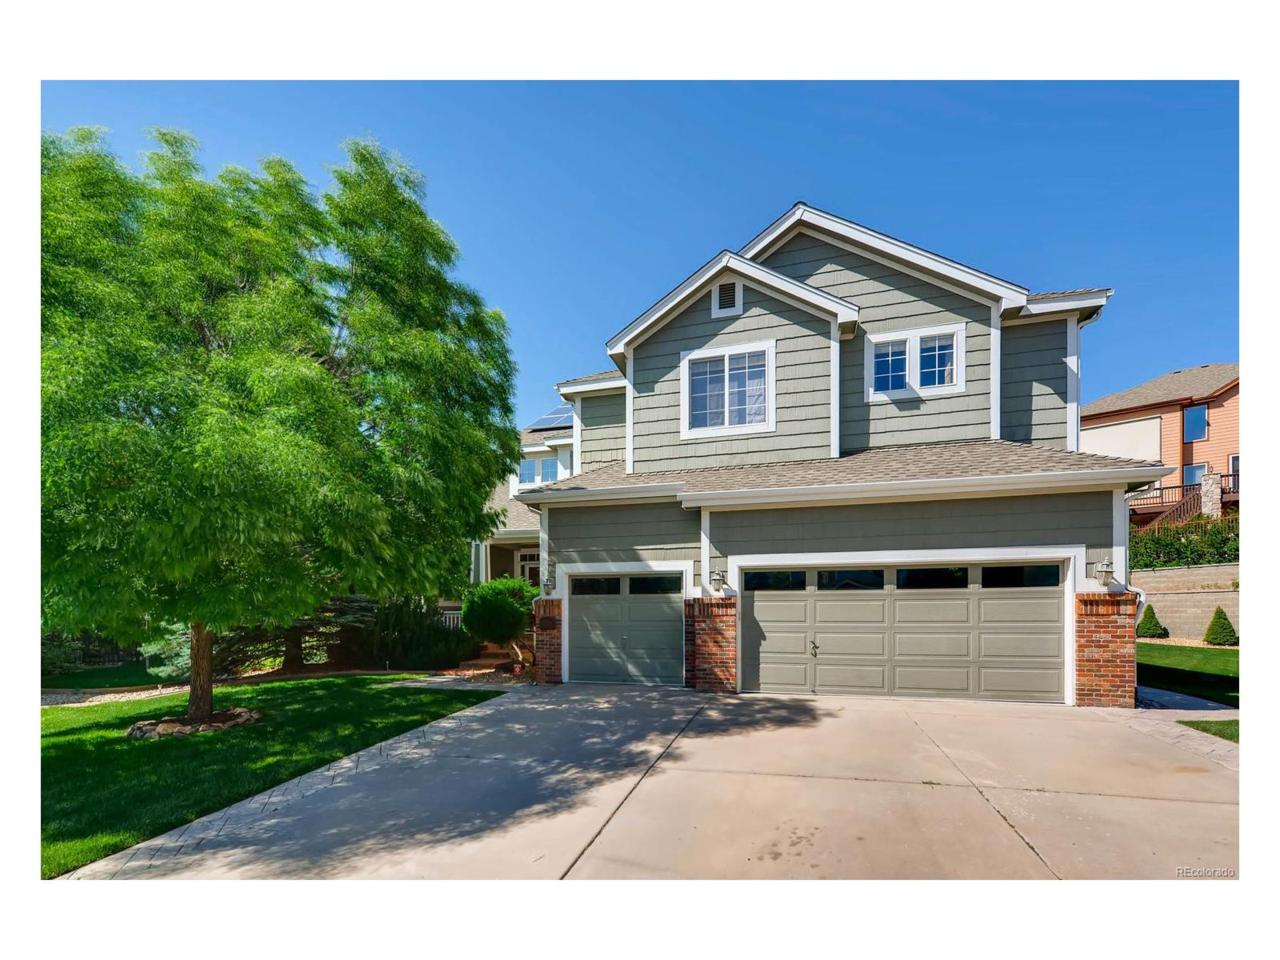 6451 S Quemoy Way, Aurora, CO 80016 (MLS #3103348) :: 8z Real Estate